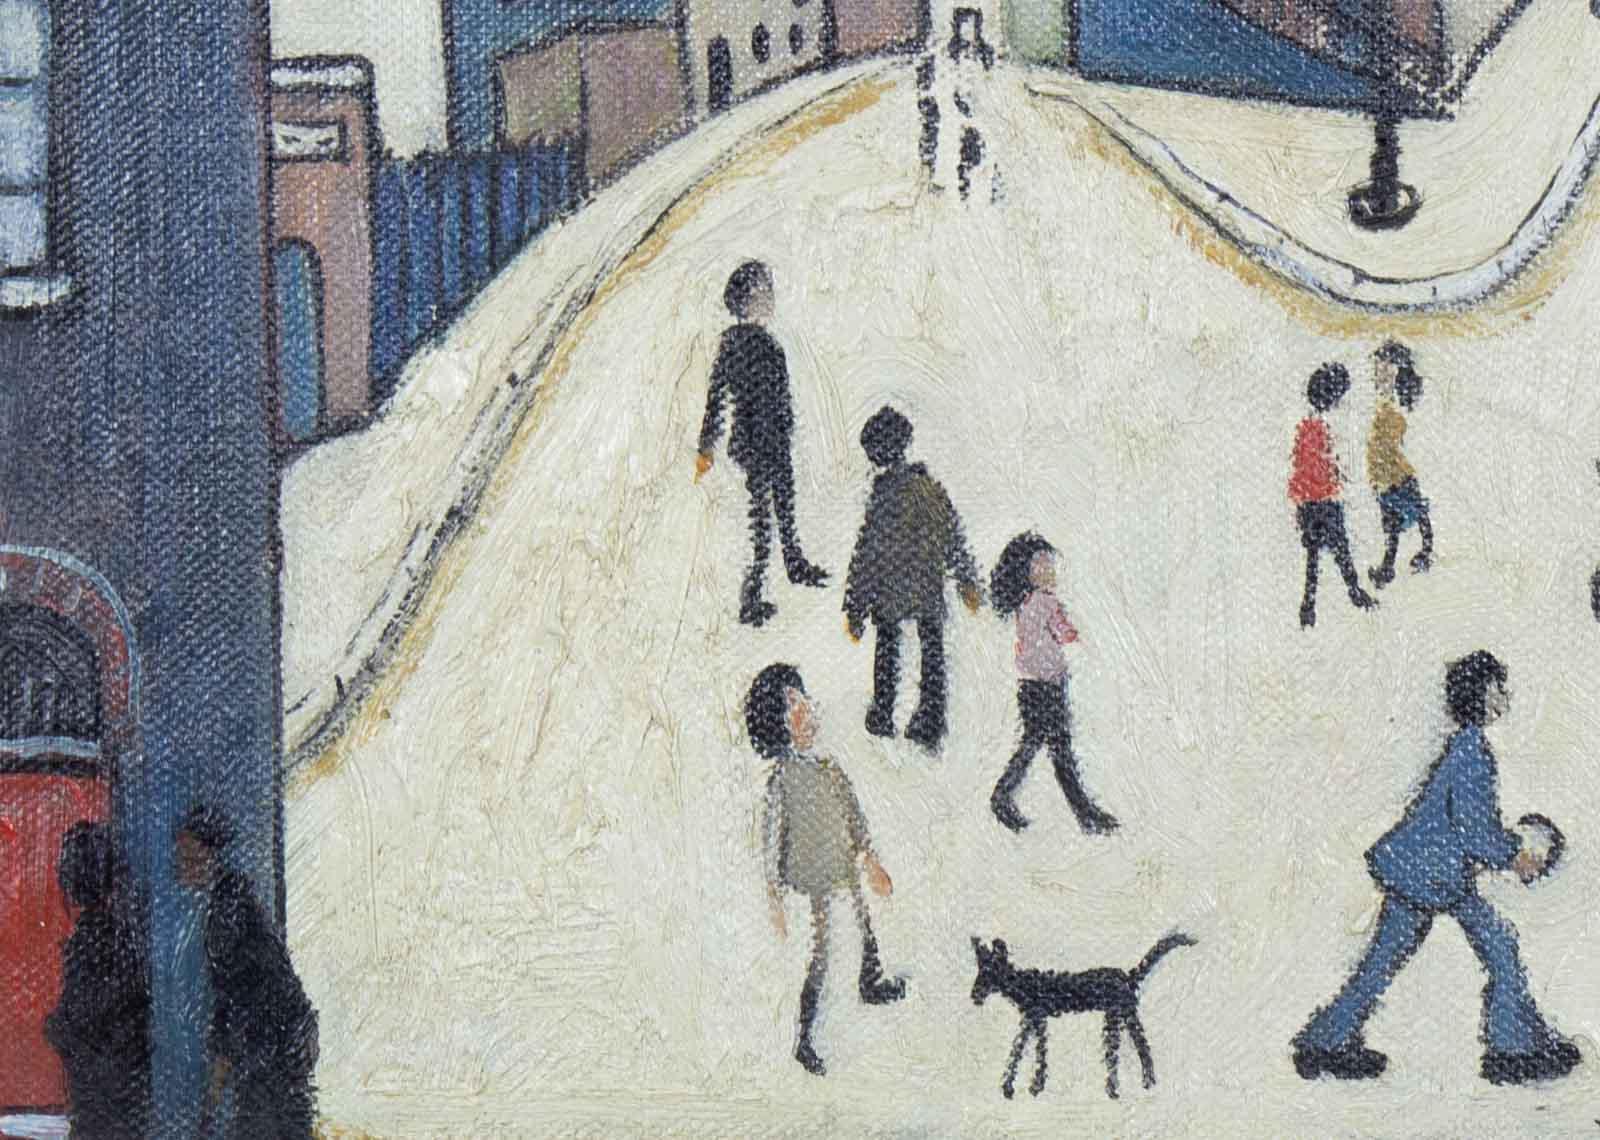 Street Scene after L.S.Lowry